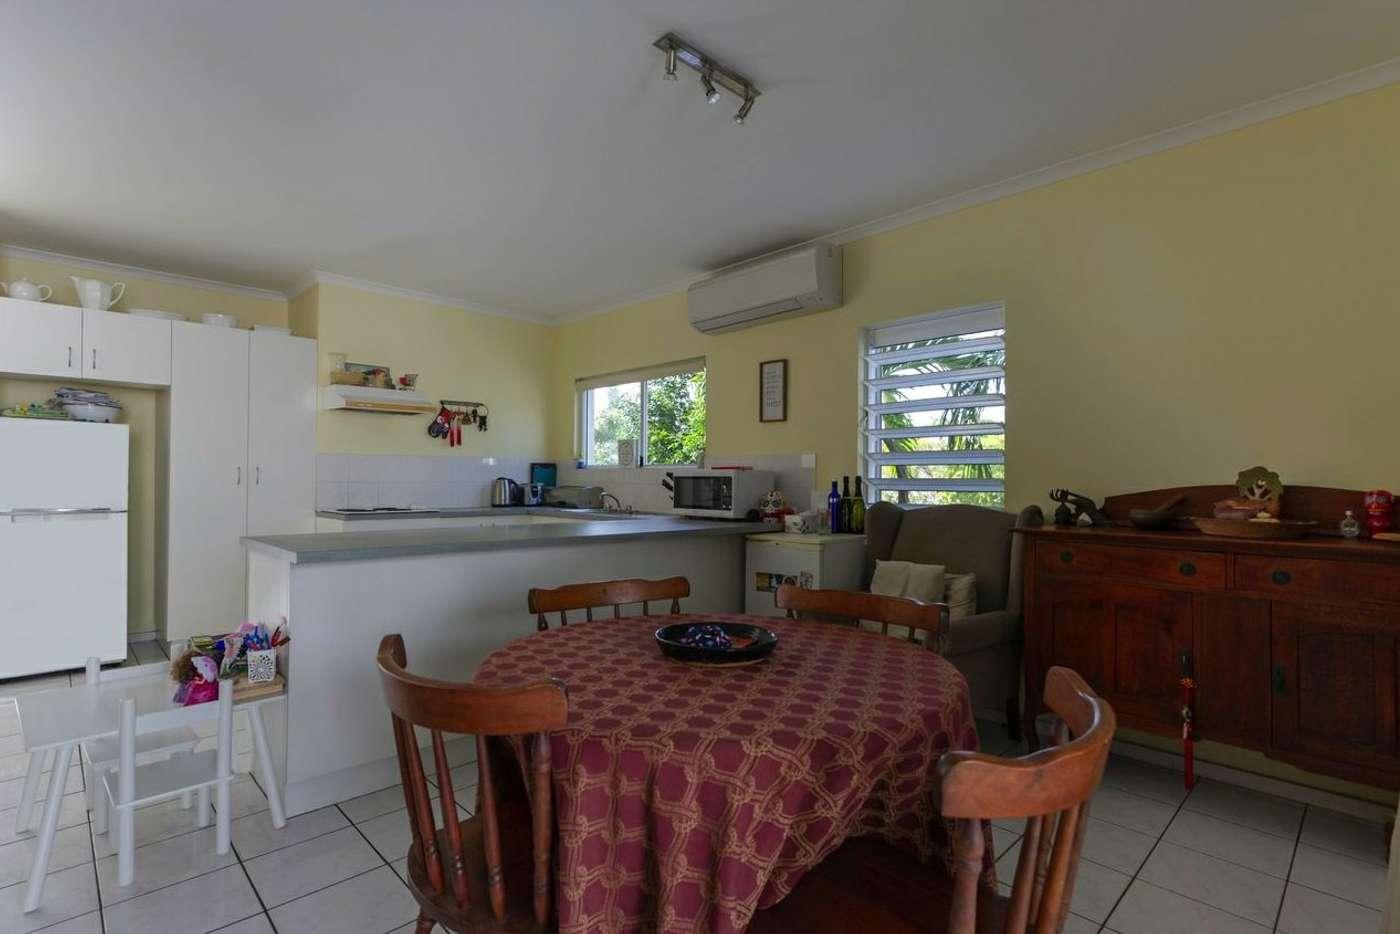 Seventh view of Homely apartment listing, 4 Sailz/1 - 3 Pecten Ave, Port Douglas QLD 4877